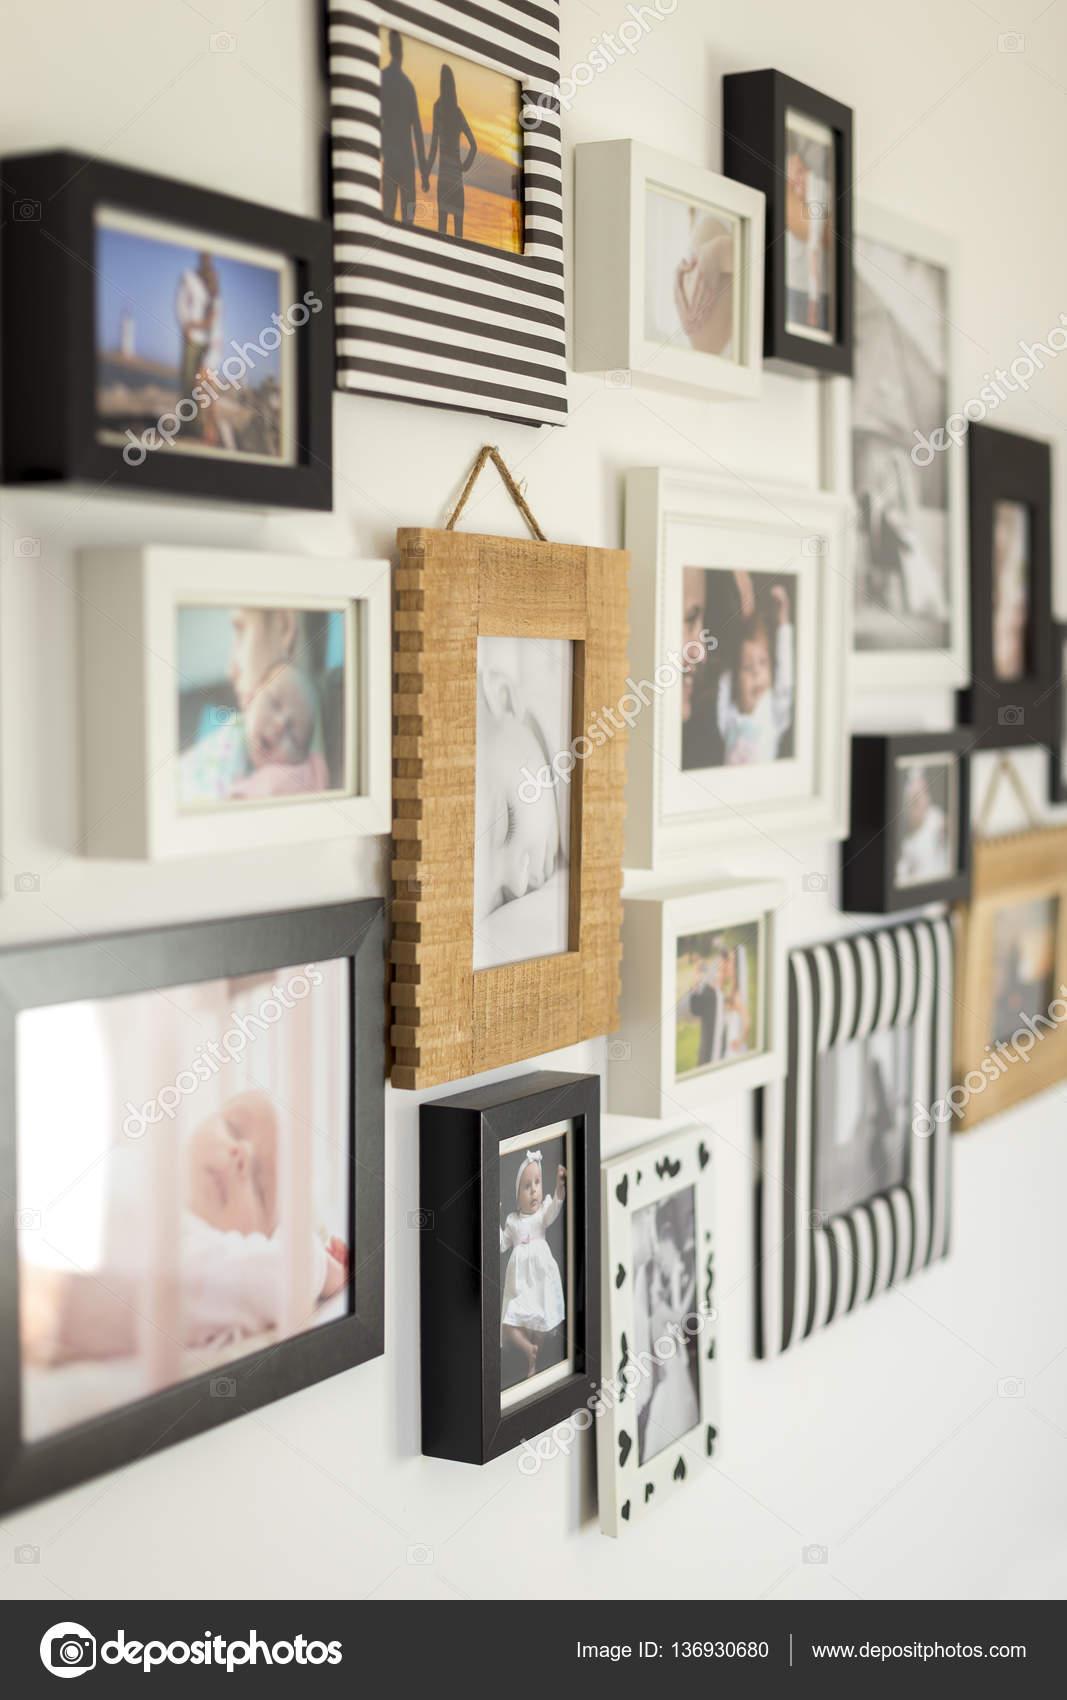 Fotos de la familia en diversos marcos — Fotos de Stock © Ondrooo ...